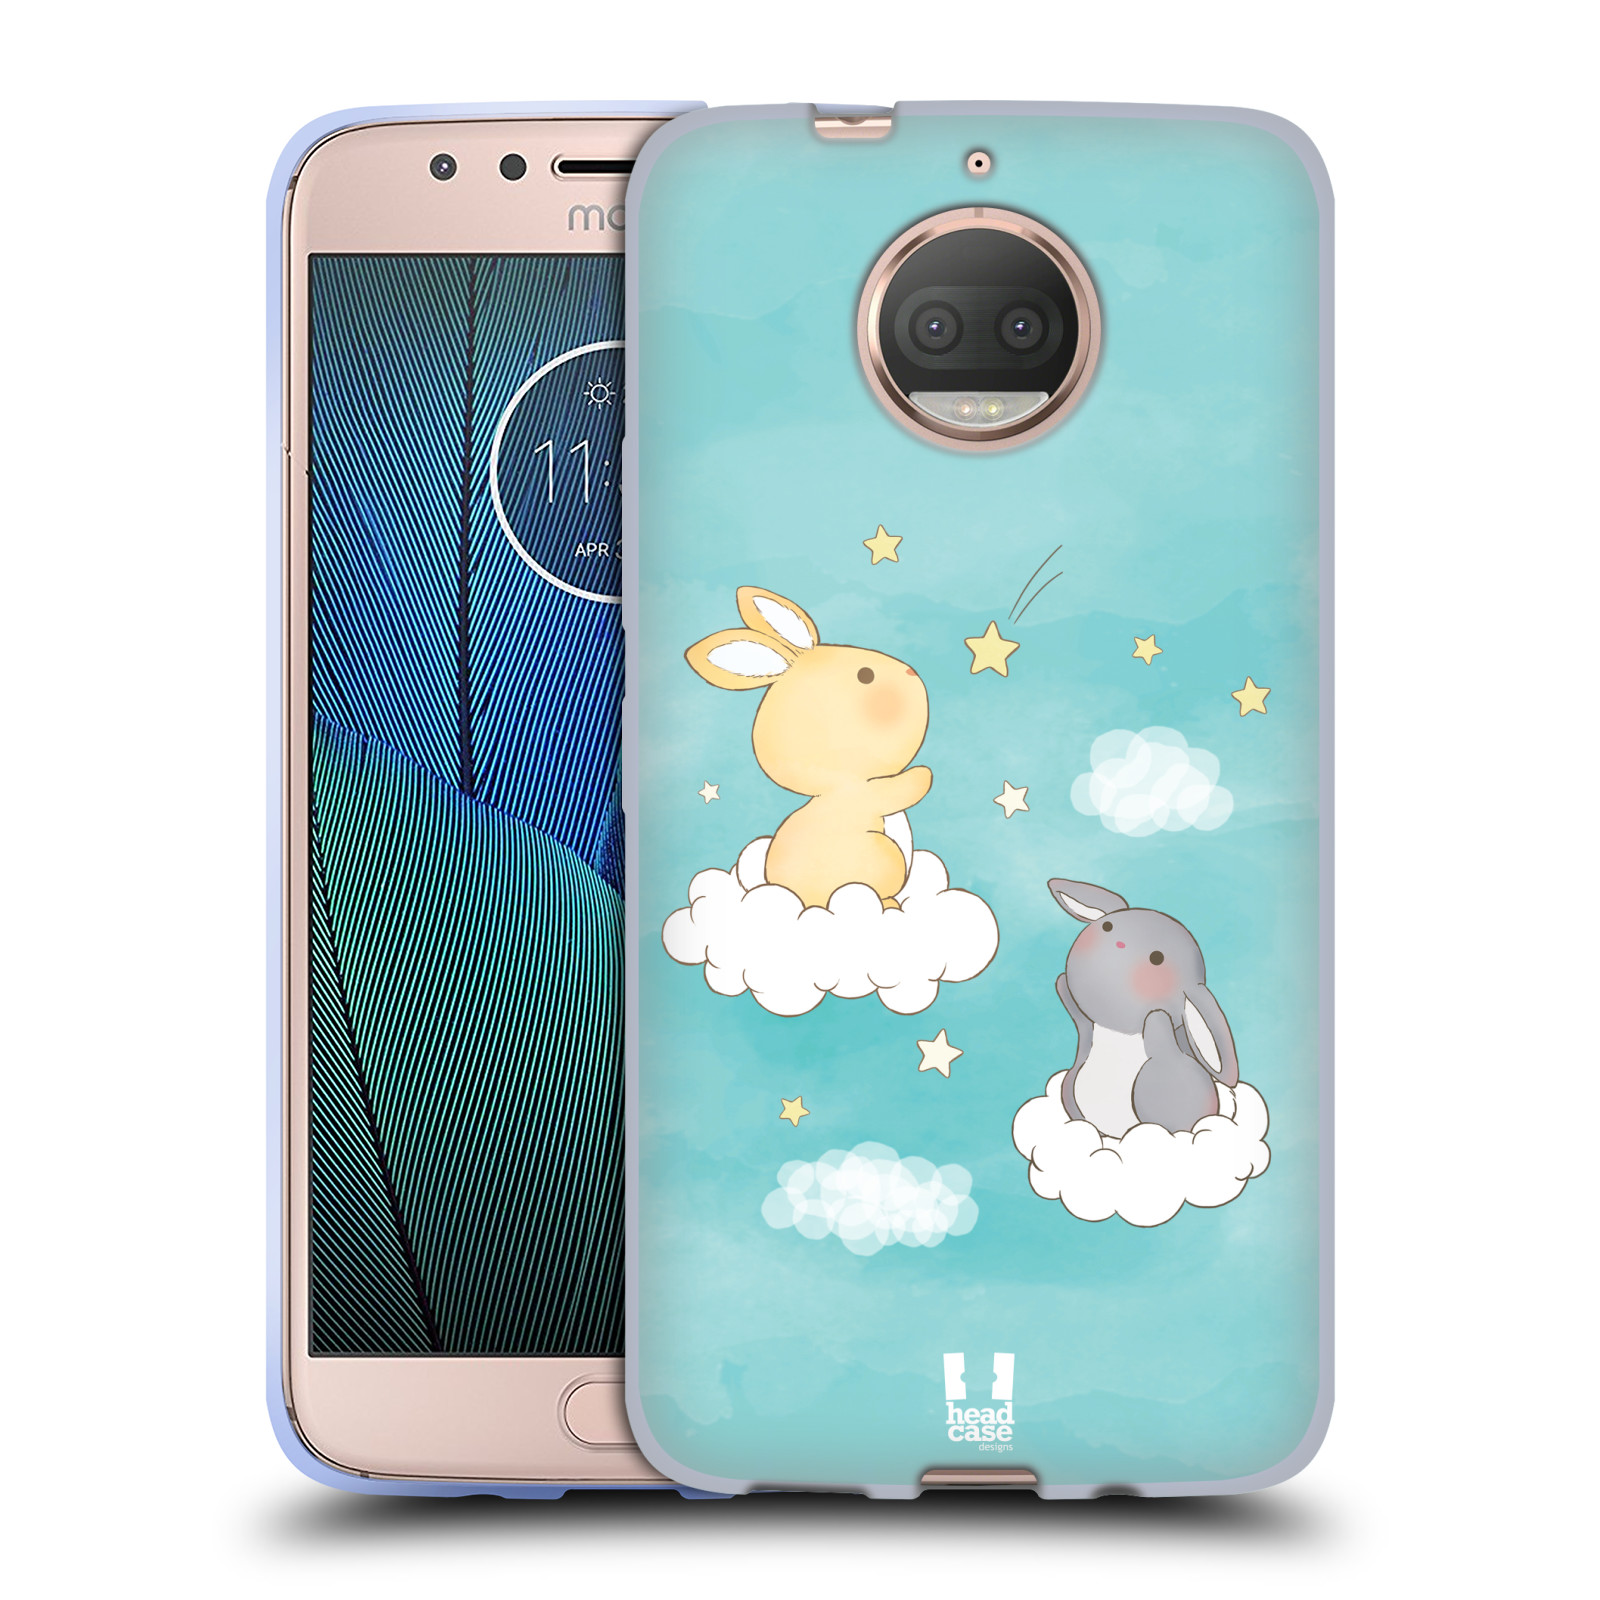 HEAD CASE silikonový obal na mobil Lenovo Moto G5s PLUS vzor králíček a hvězdy modrá